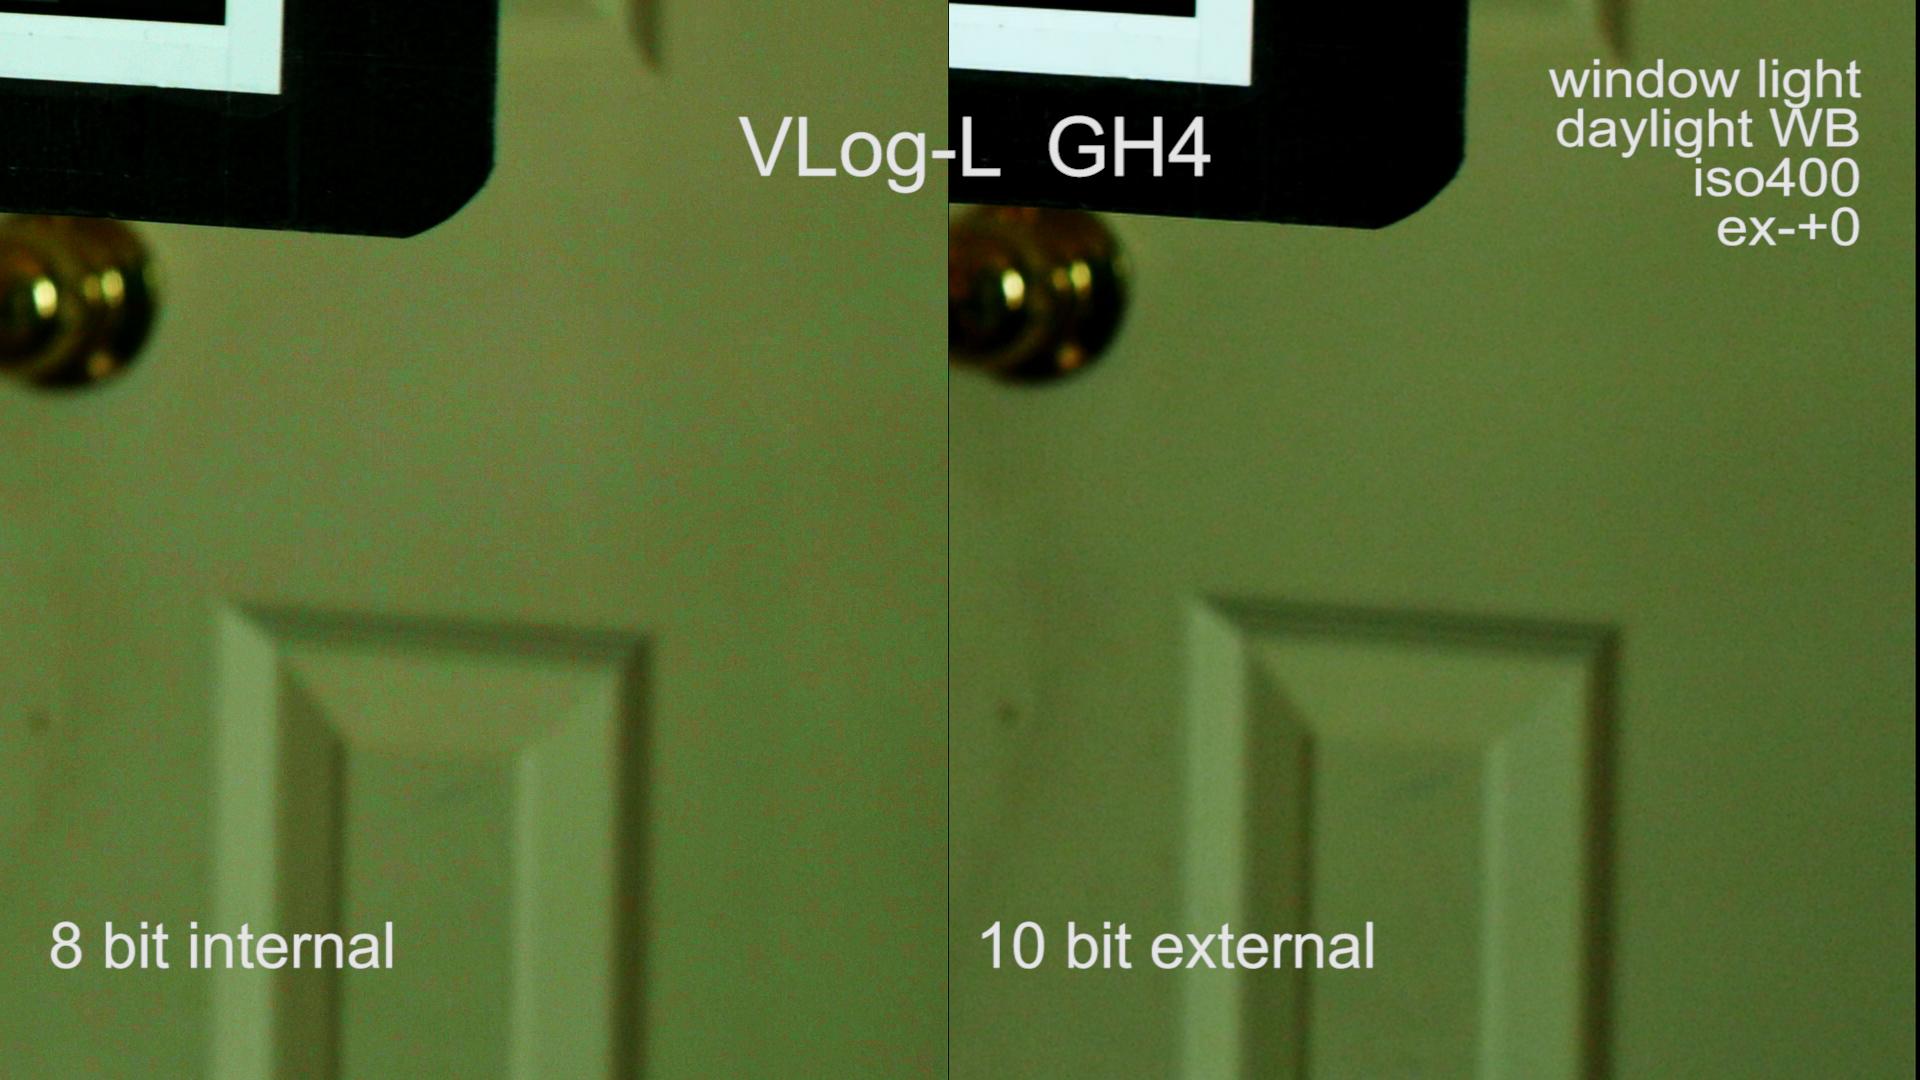 GH4 Firmware 2 3, V-log for $99, Epic Panasonic marketing